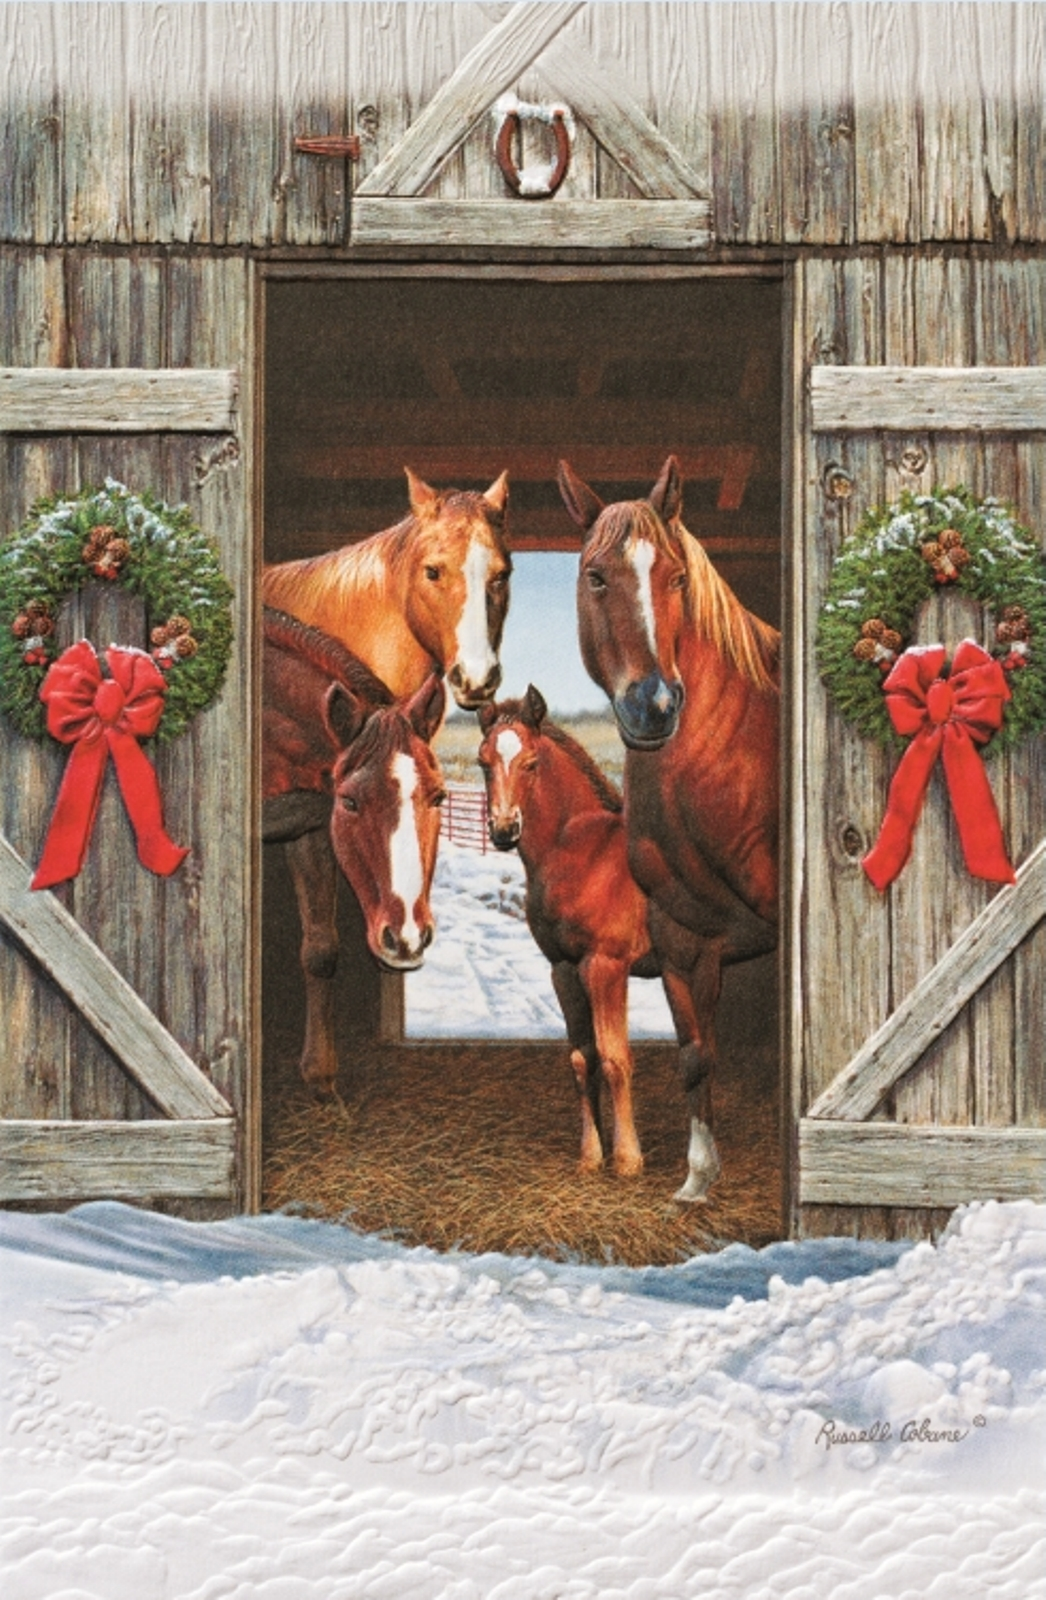 Bright Morning Horses And Colt Christmas Barn 16 Boxed Holiday Cards Envelopes